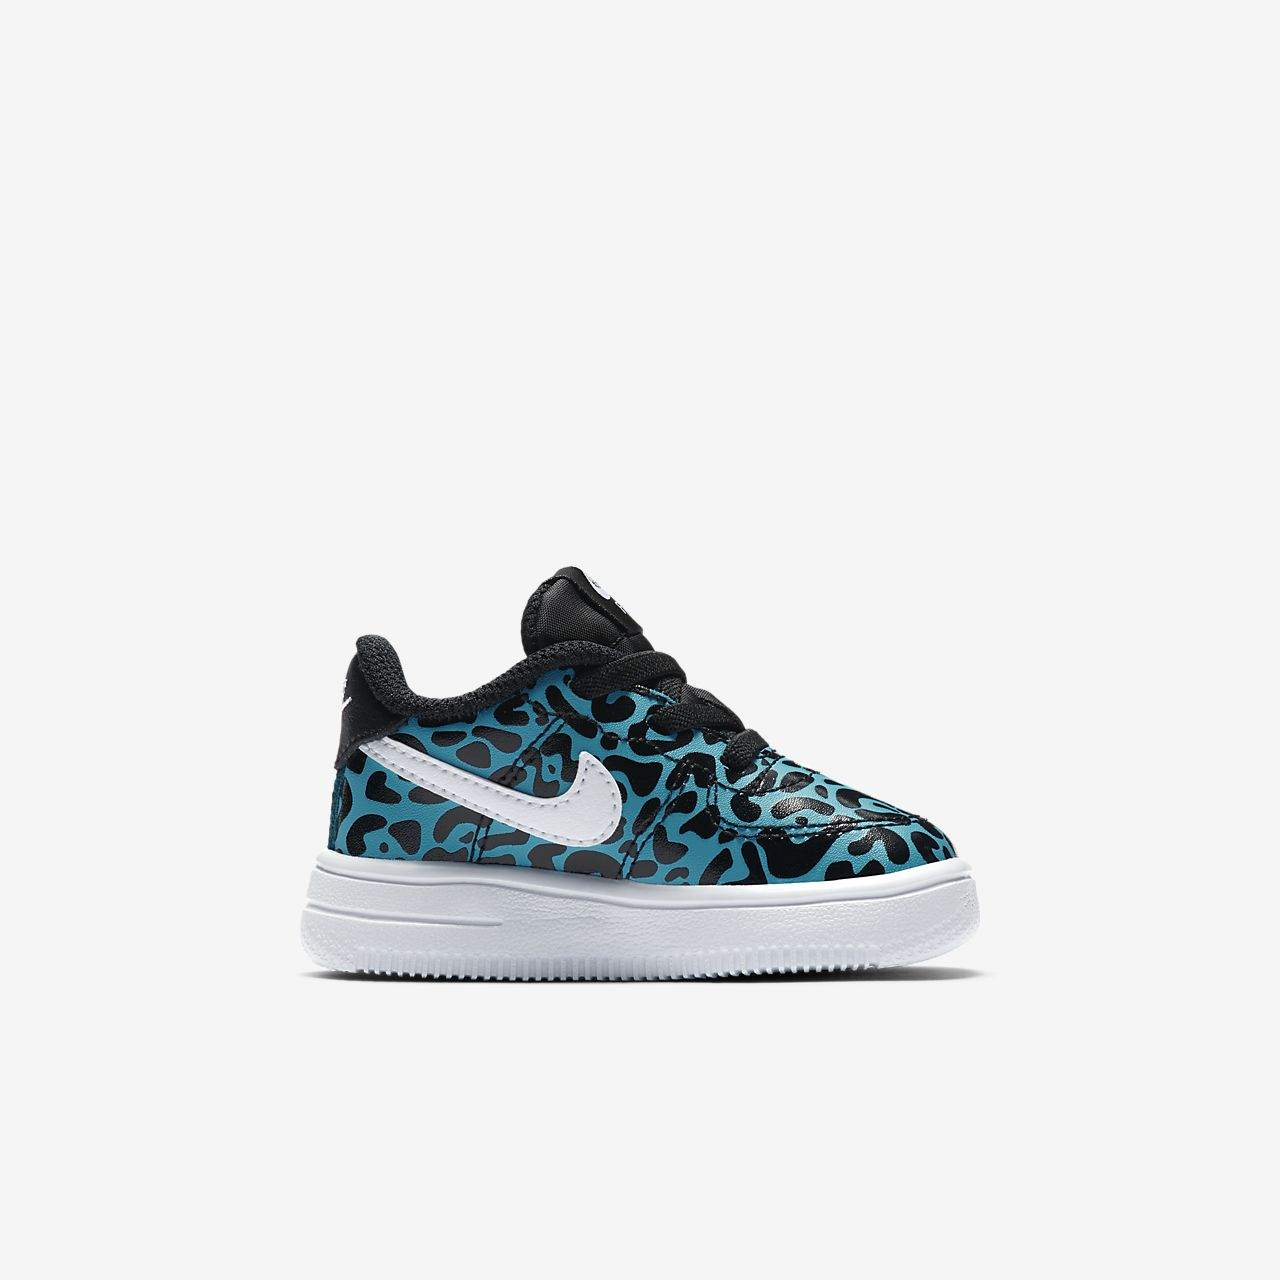 Nike Force 1 18 Print Neonati Descuento Para Barato Calidad Superior Barato Tienda De Descuento Para o3tTYo8xm